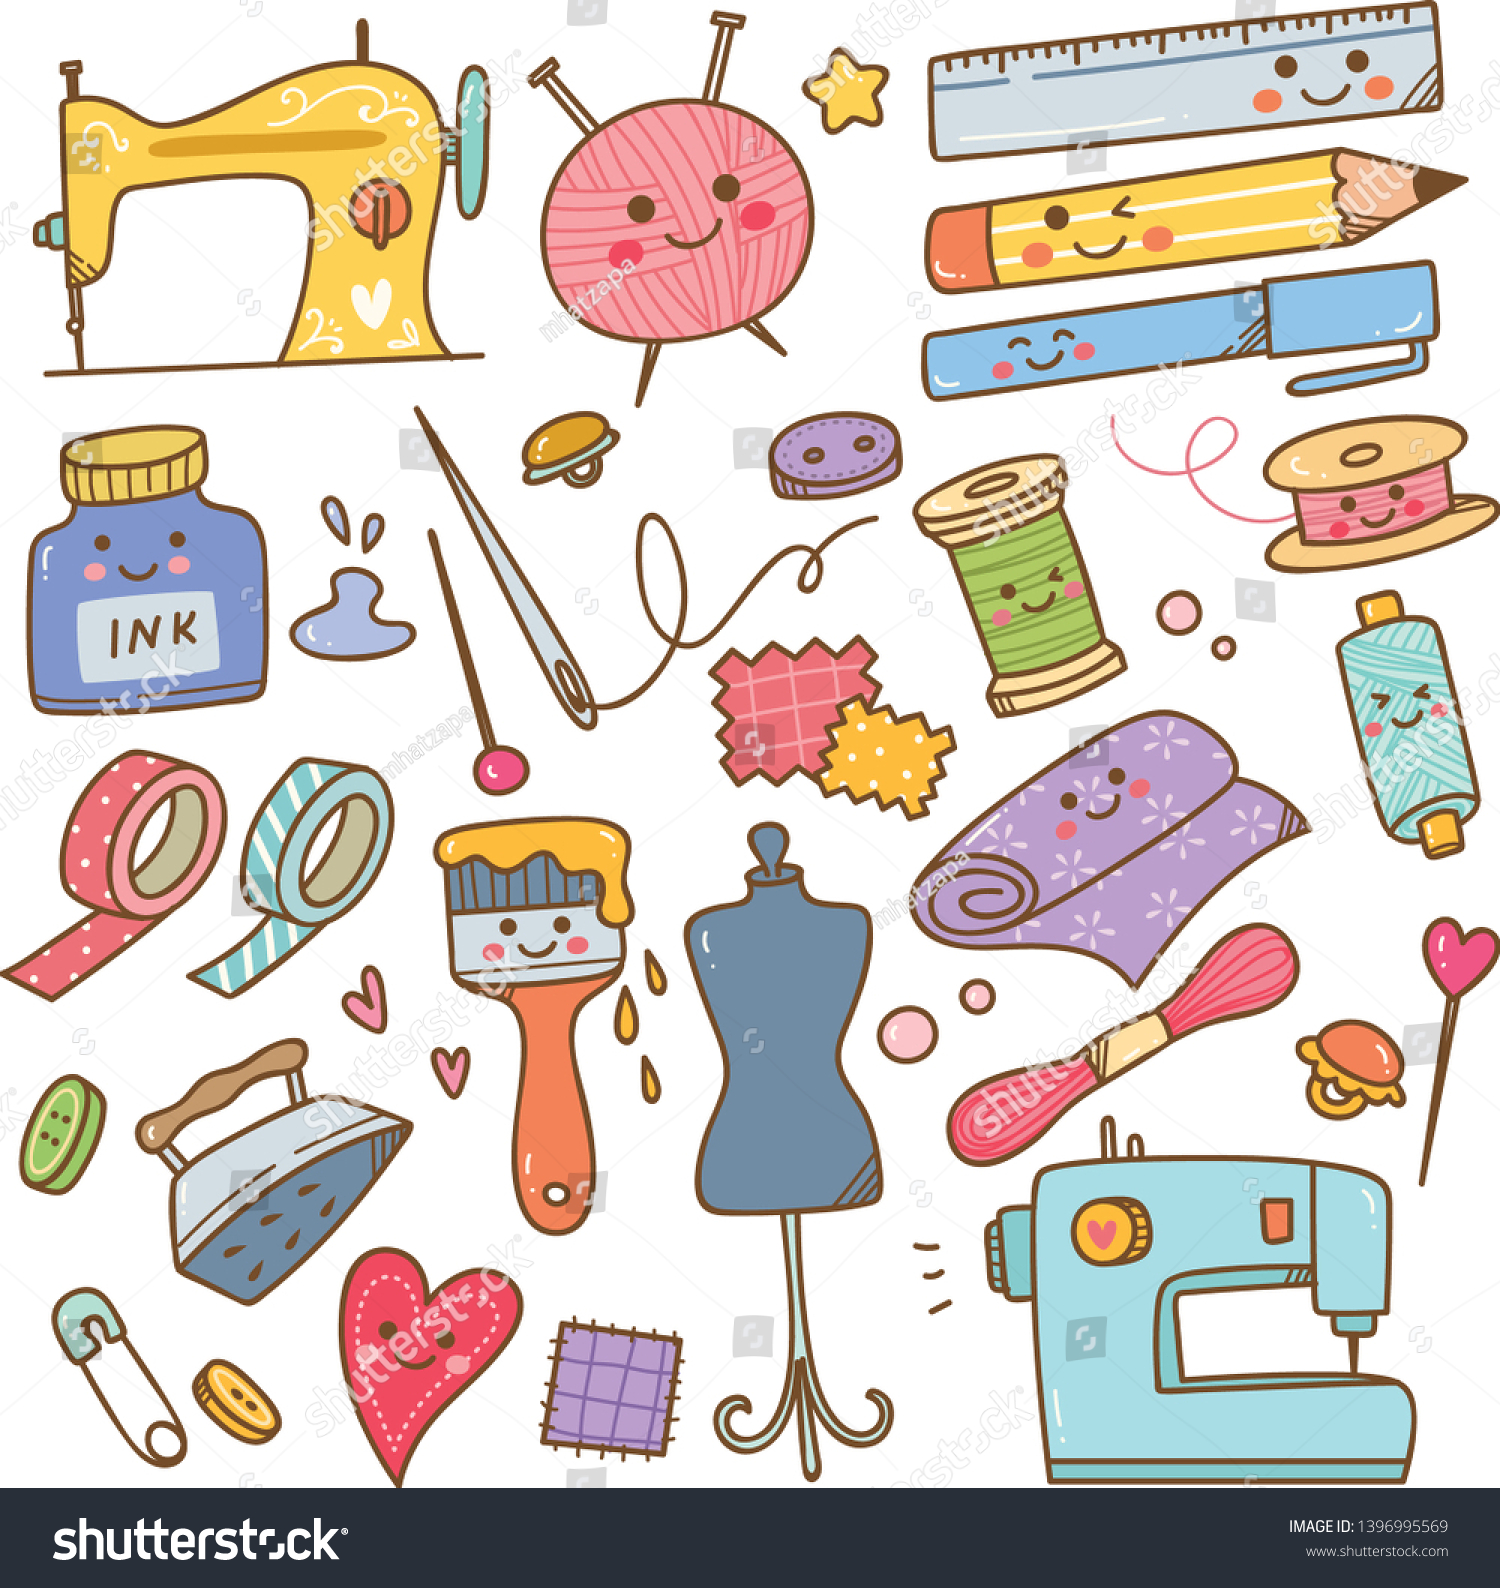 Art Craft Supplies Doodle Diy Tools Stock Vector Royalty Free 1396995569